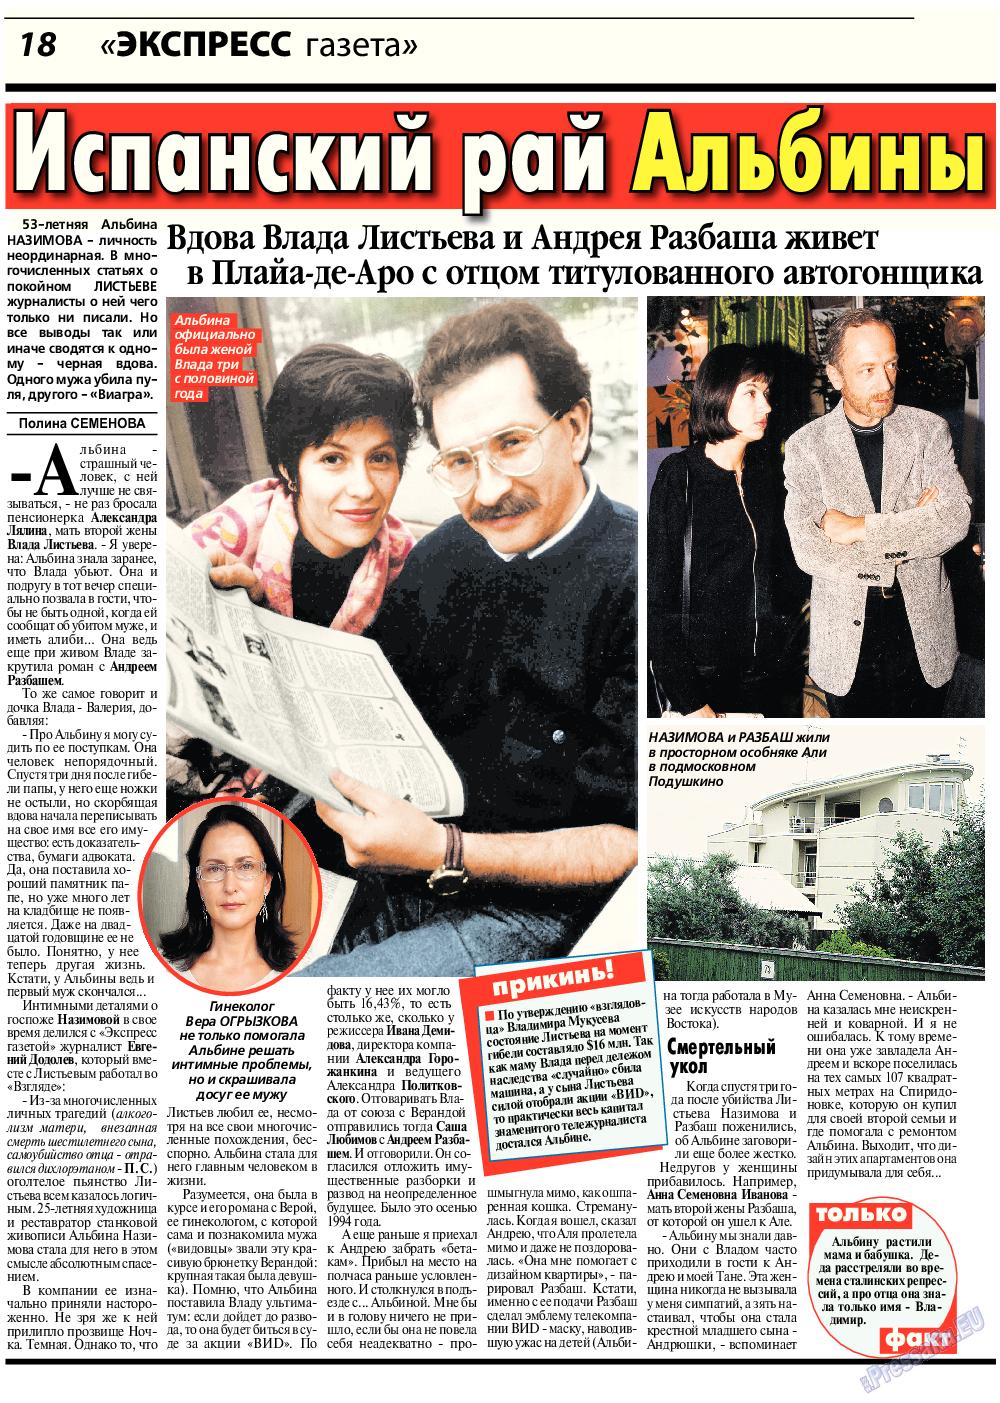 Экспресс газета (газета). 2017 год, номер 8, стр. 18